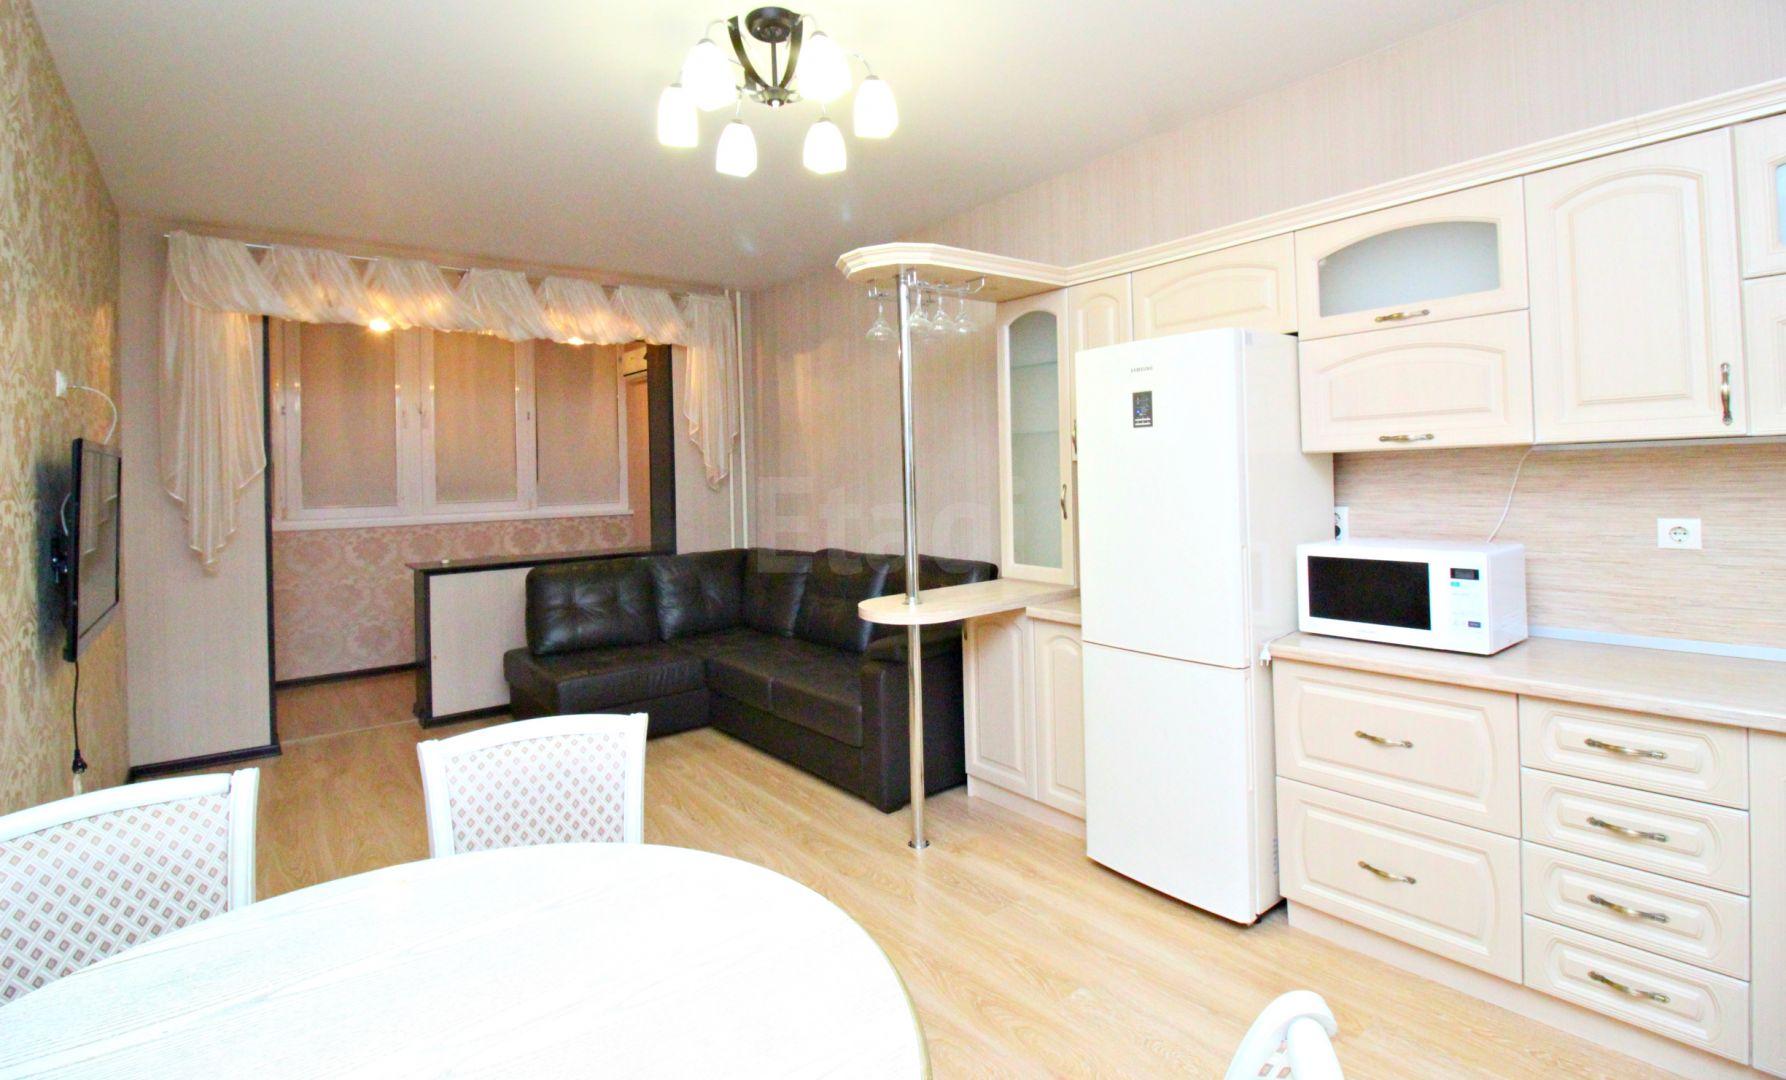 Продается двухкомнатная квартира за 4 350 000 рублей. ЦМР, ул. Фабричная (2.9 км до центра).